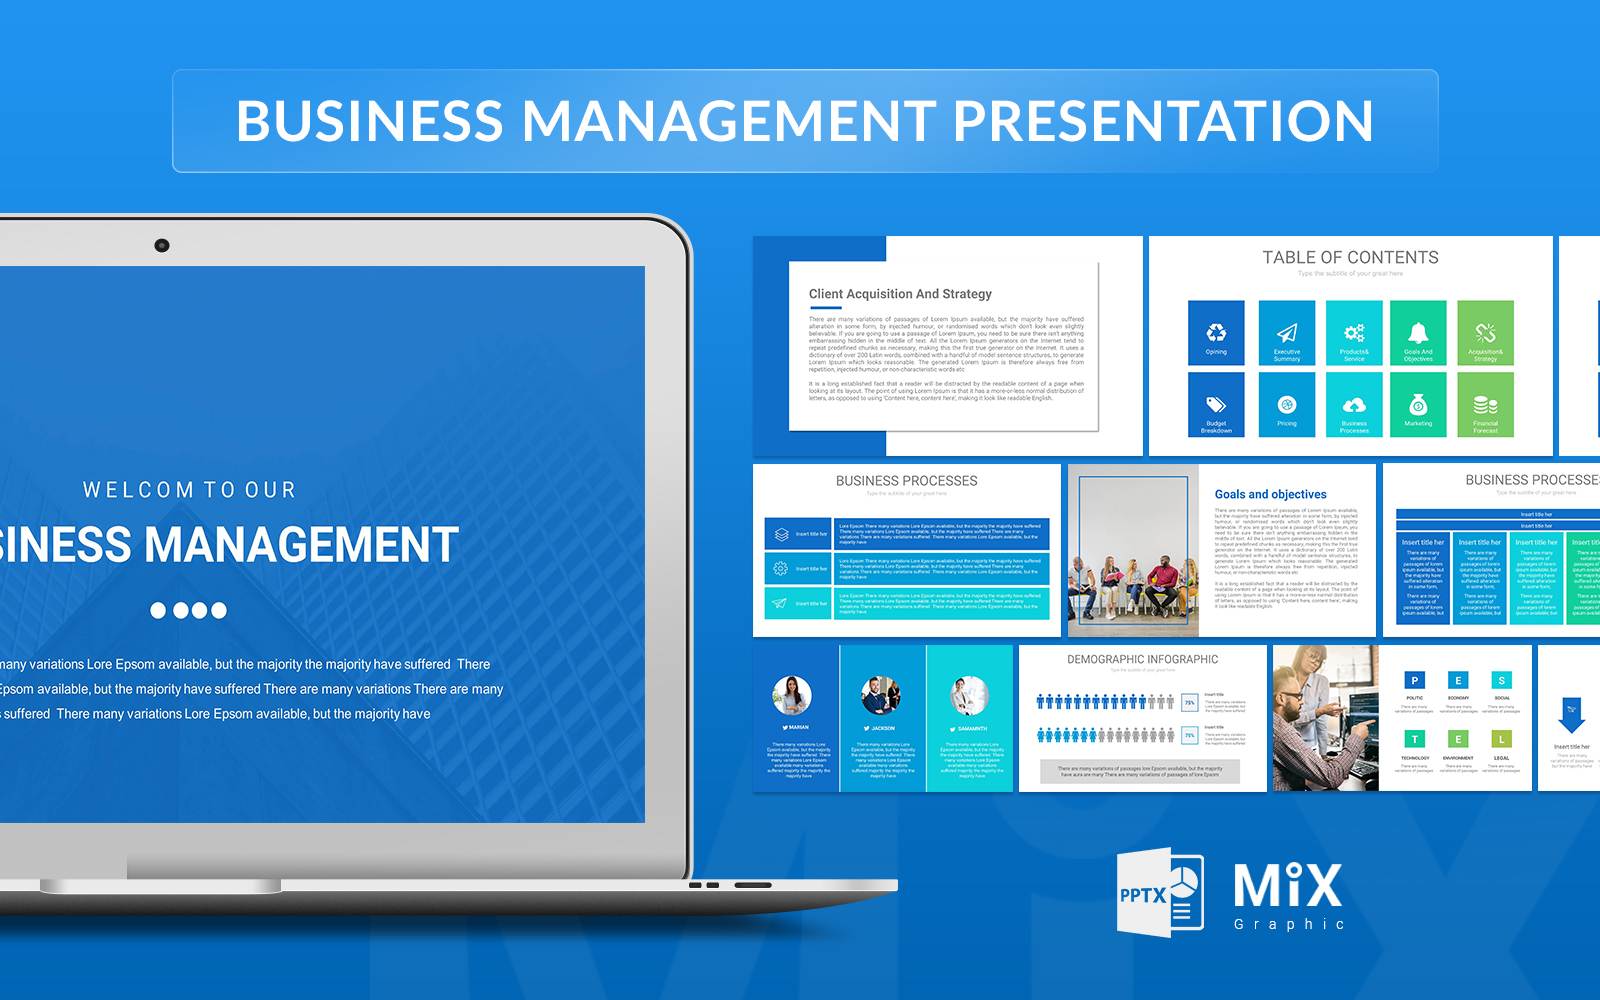 Business Management Presentation PowerPoint Template